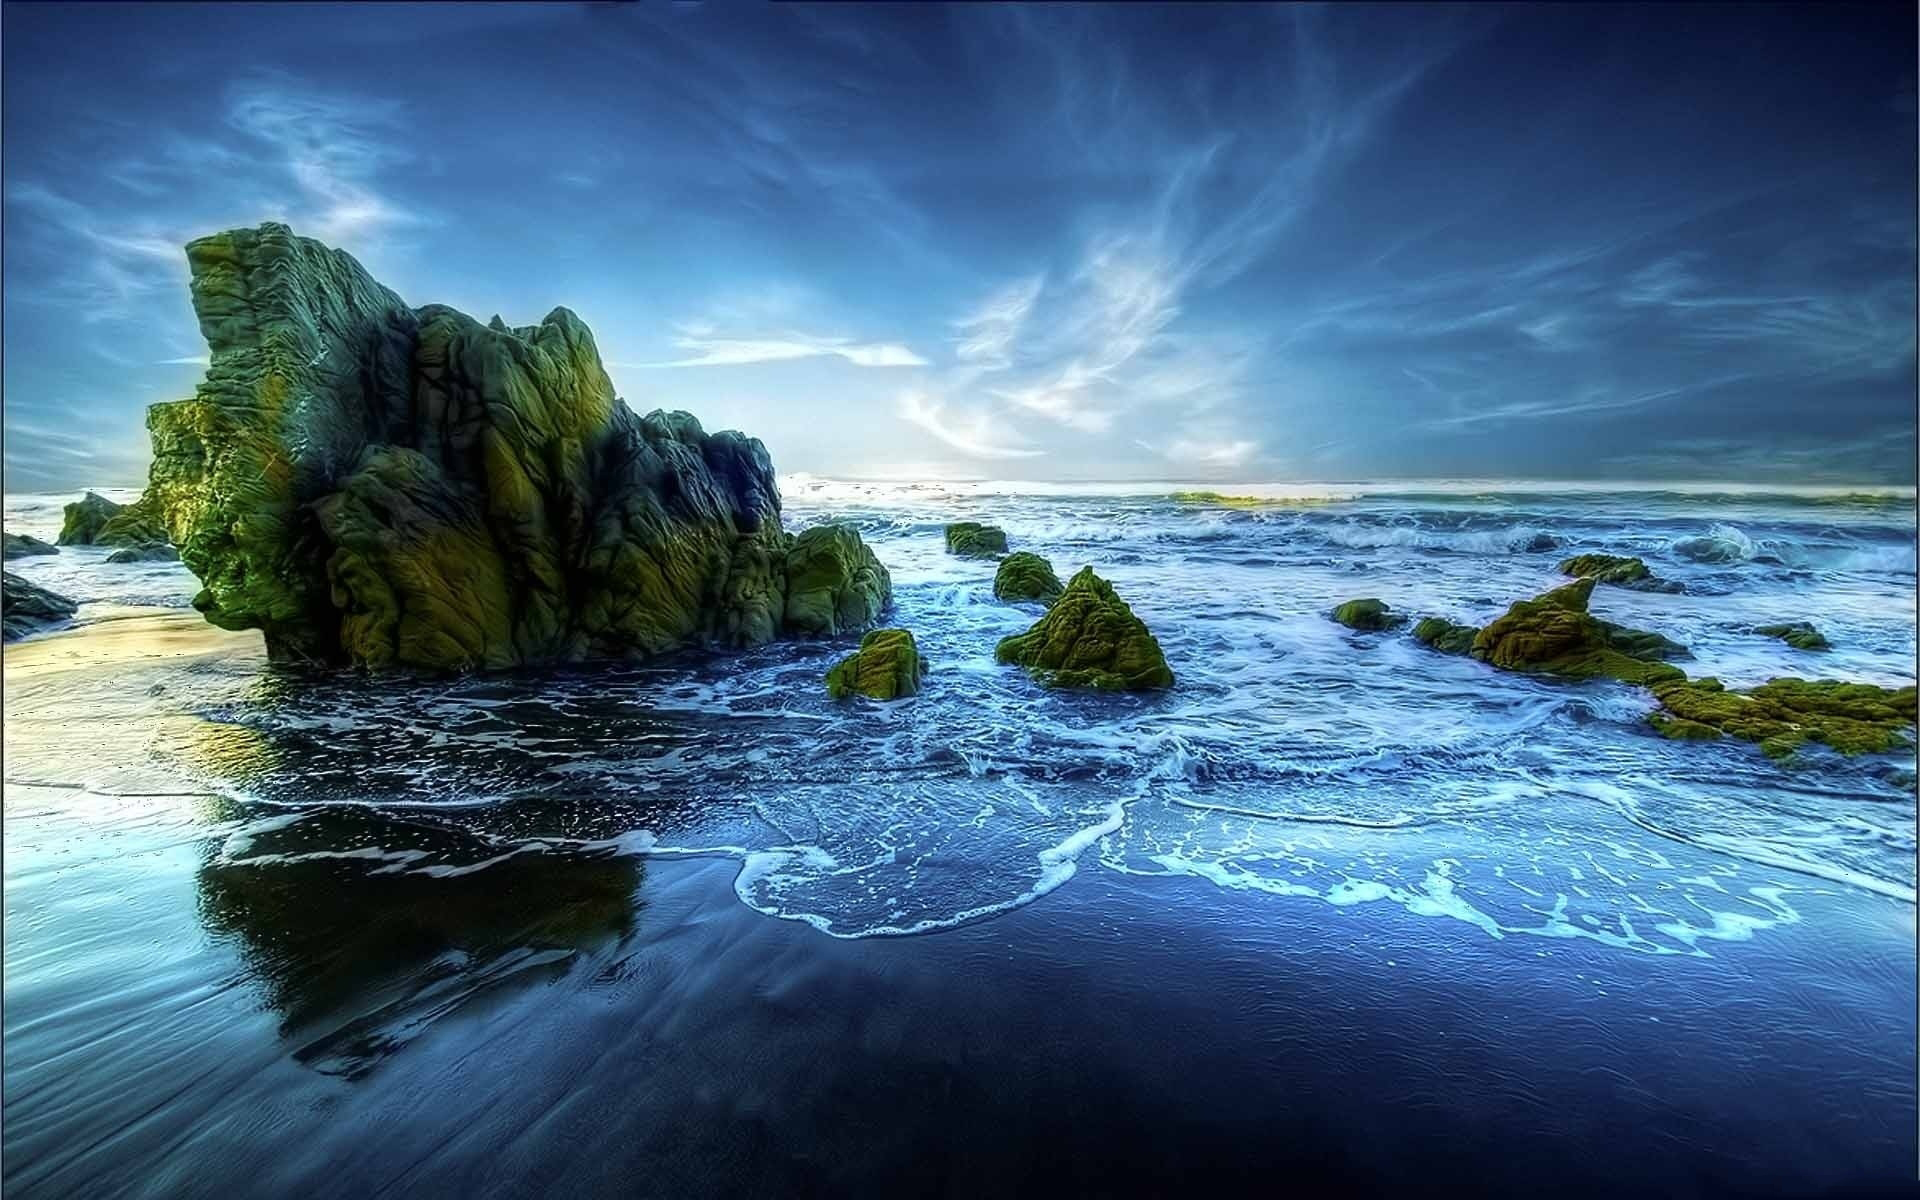 Ocean HD Wallpaper Background Image